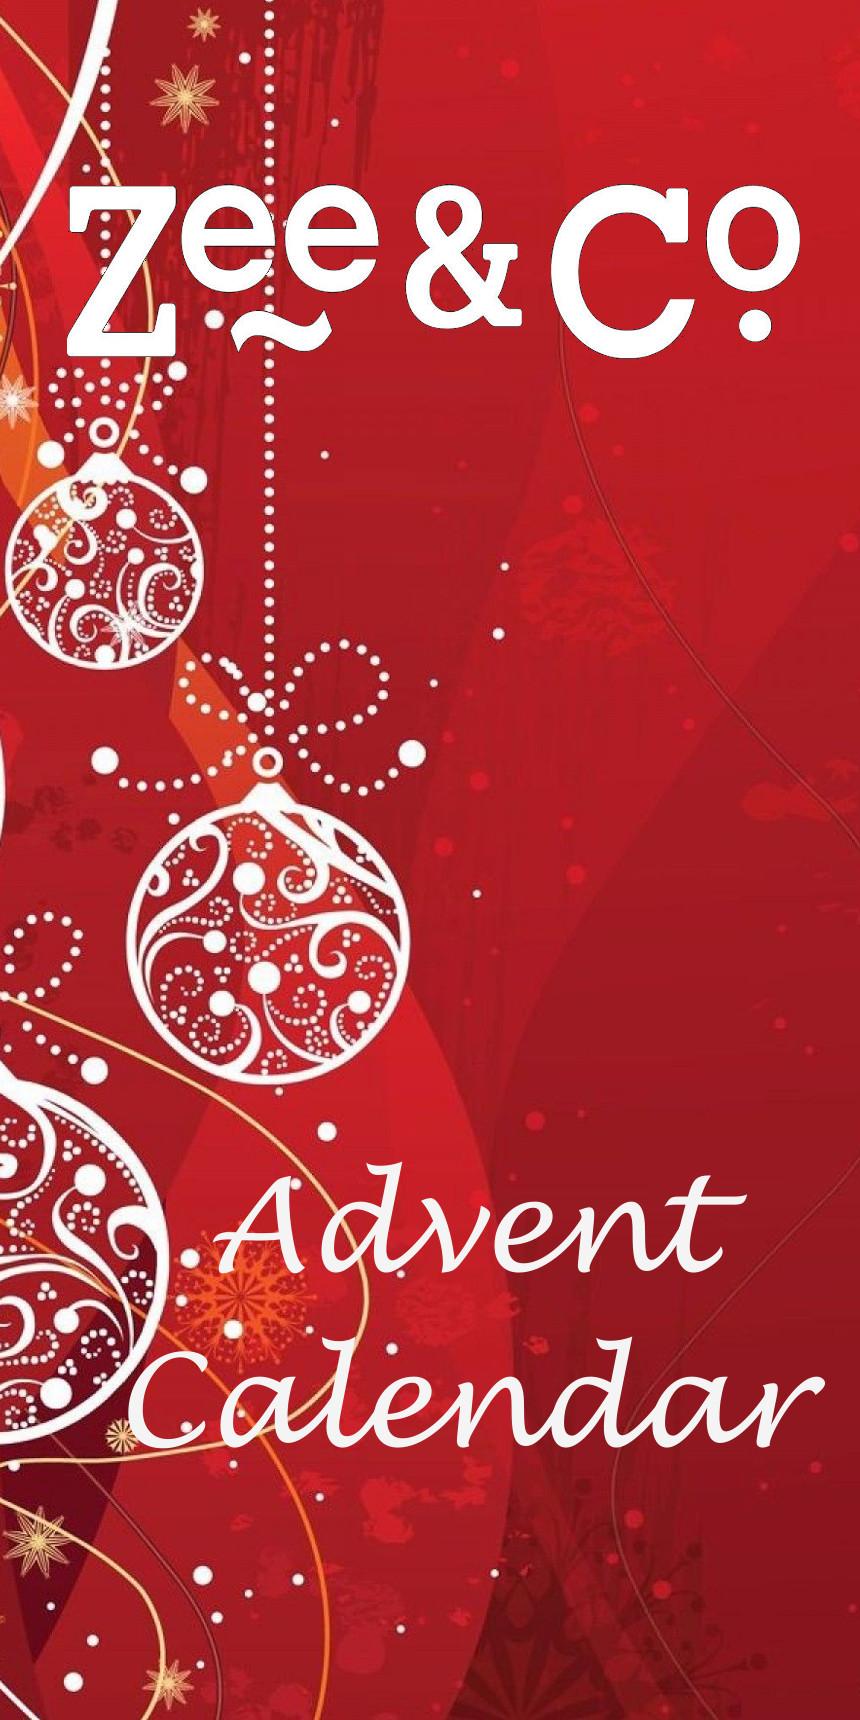 The Zee & Co Christmas Countdown